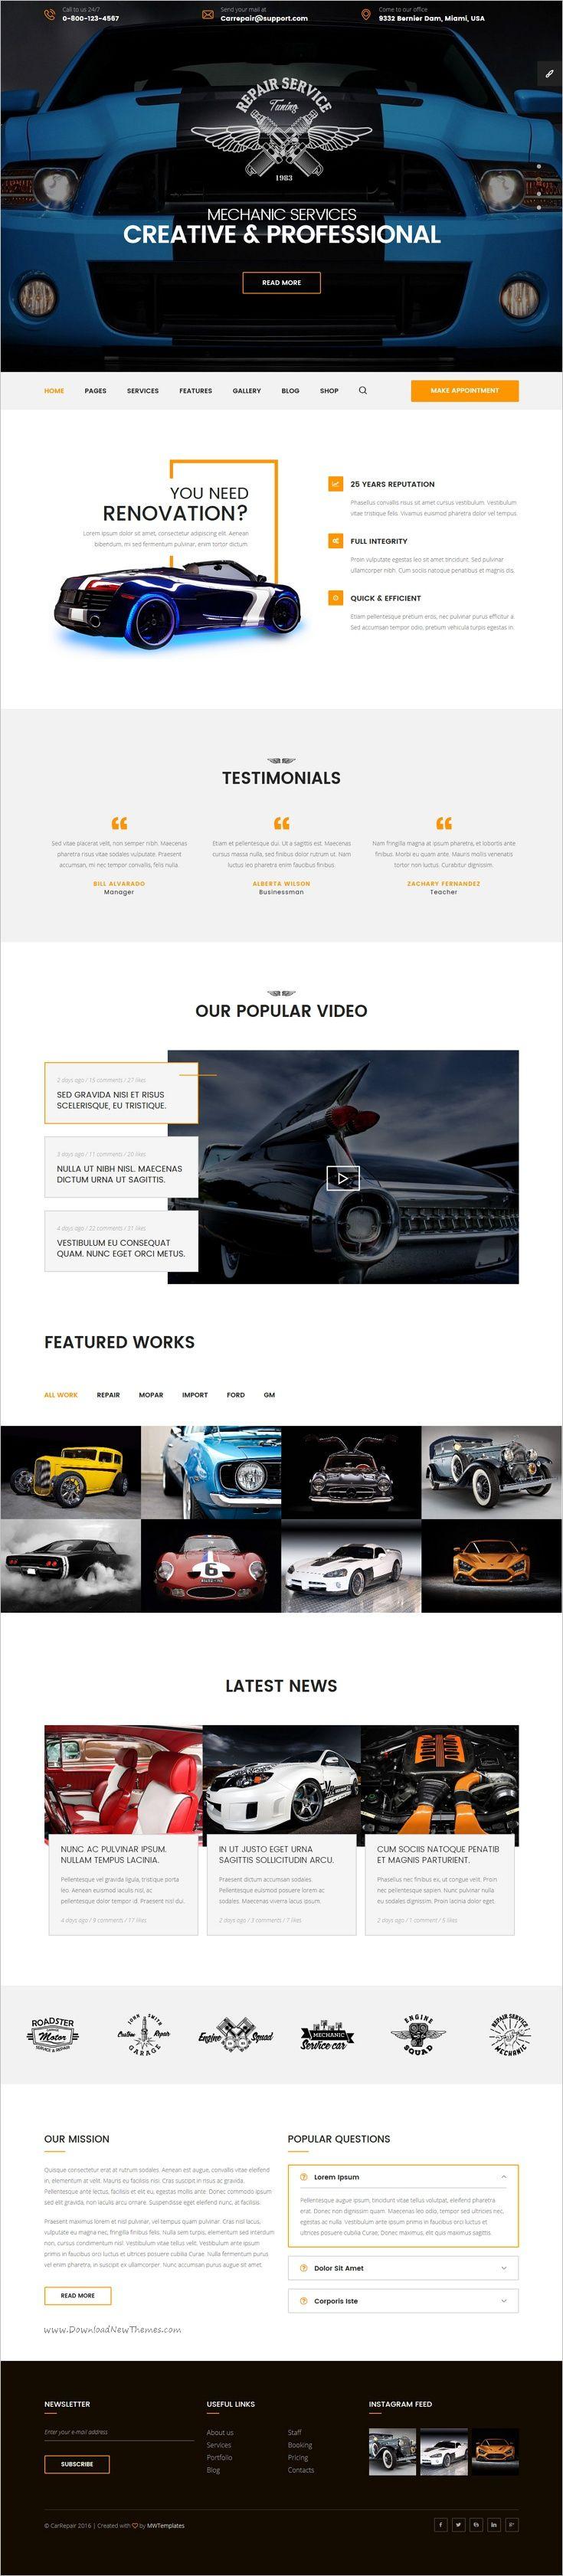 Mechanic car repair tuning routine maintenance html template with visual builder